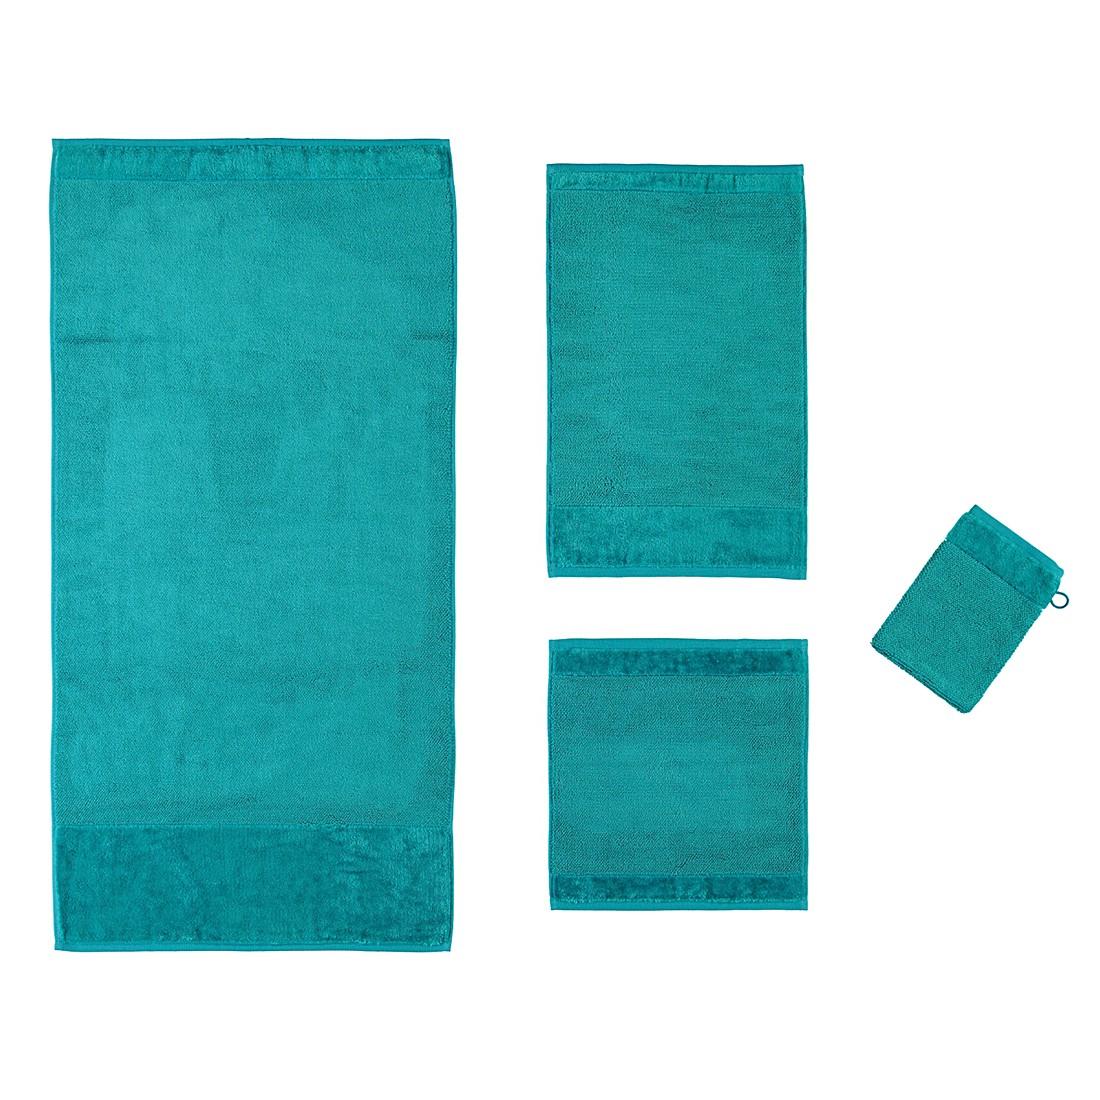 Handtücher Bamboo Luxe – Baumwolle/Viskose – Ocean – Seiflappen 30×30 cm, Möve günstig bestellen